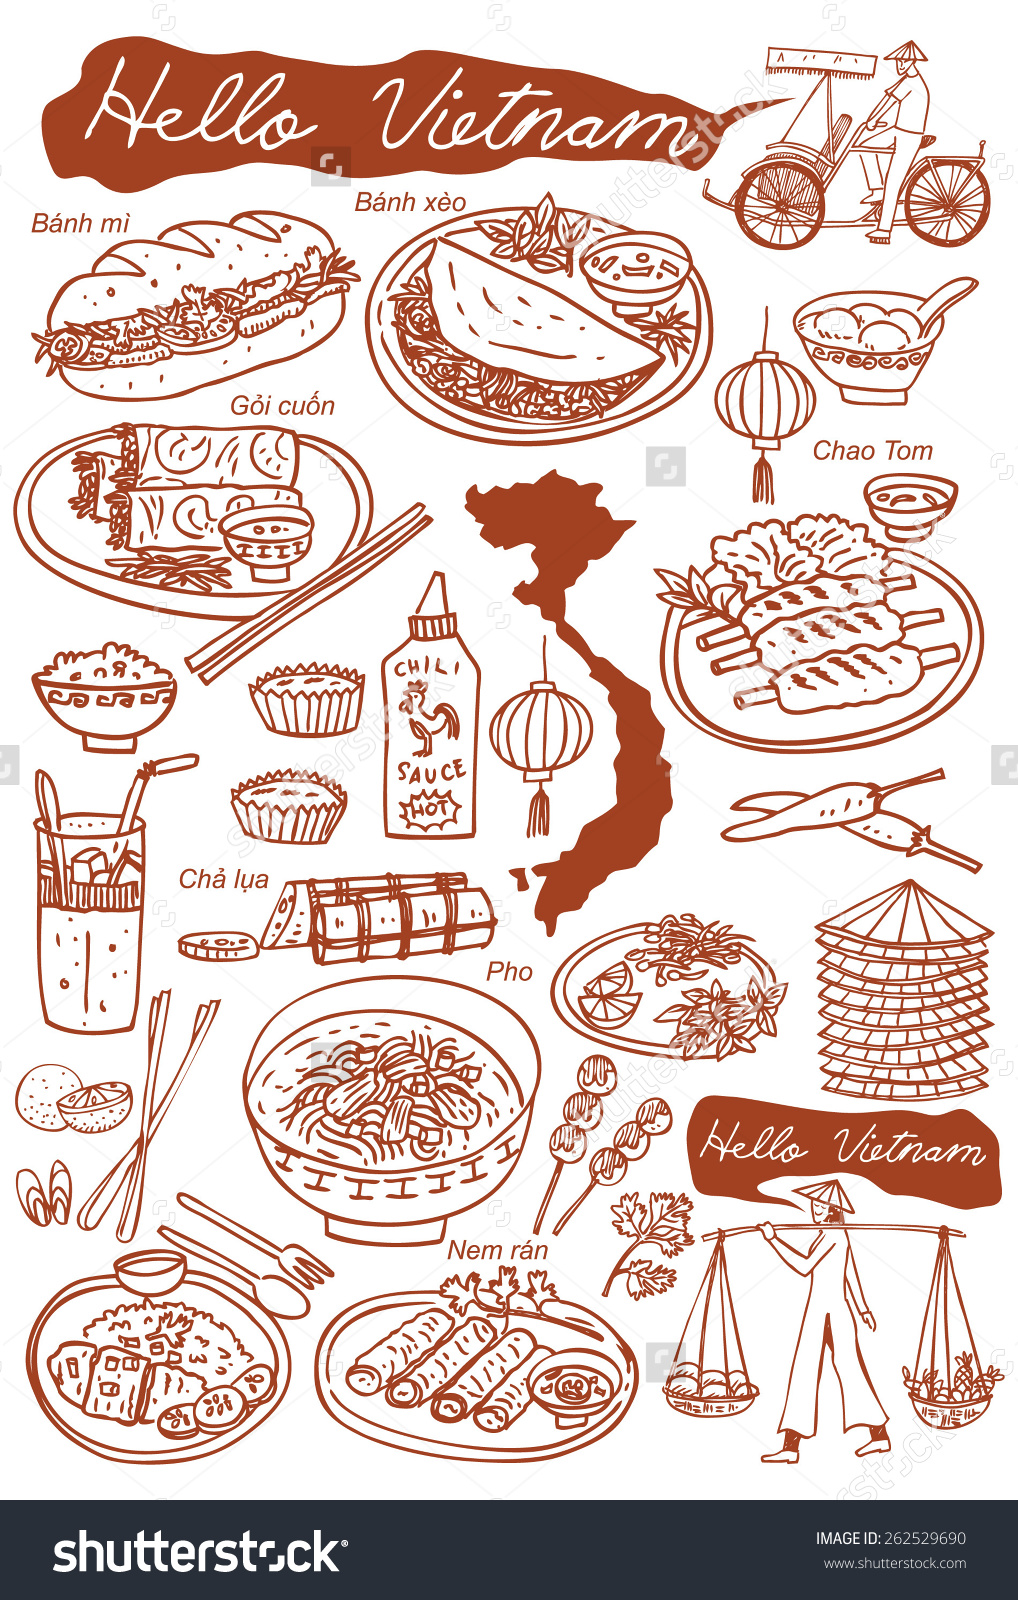 Vietnam clipart pho Watermark non food clipart watermark